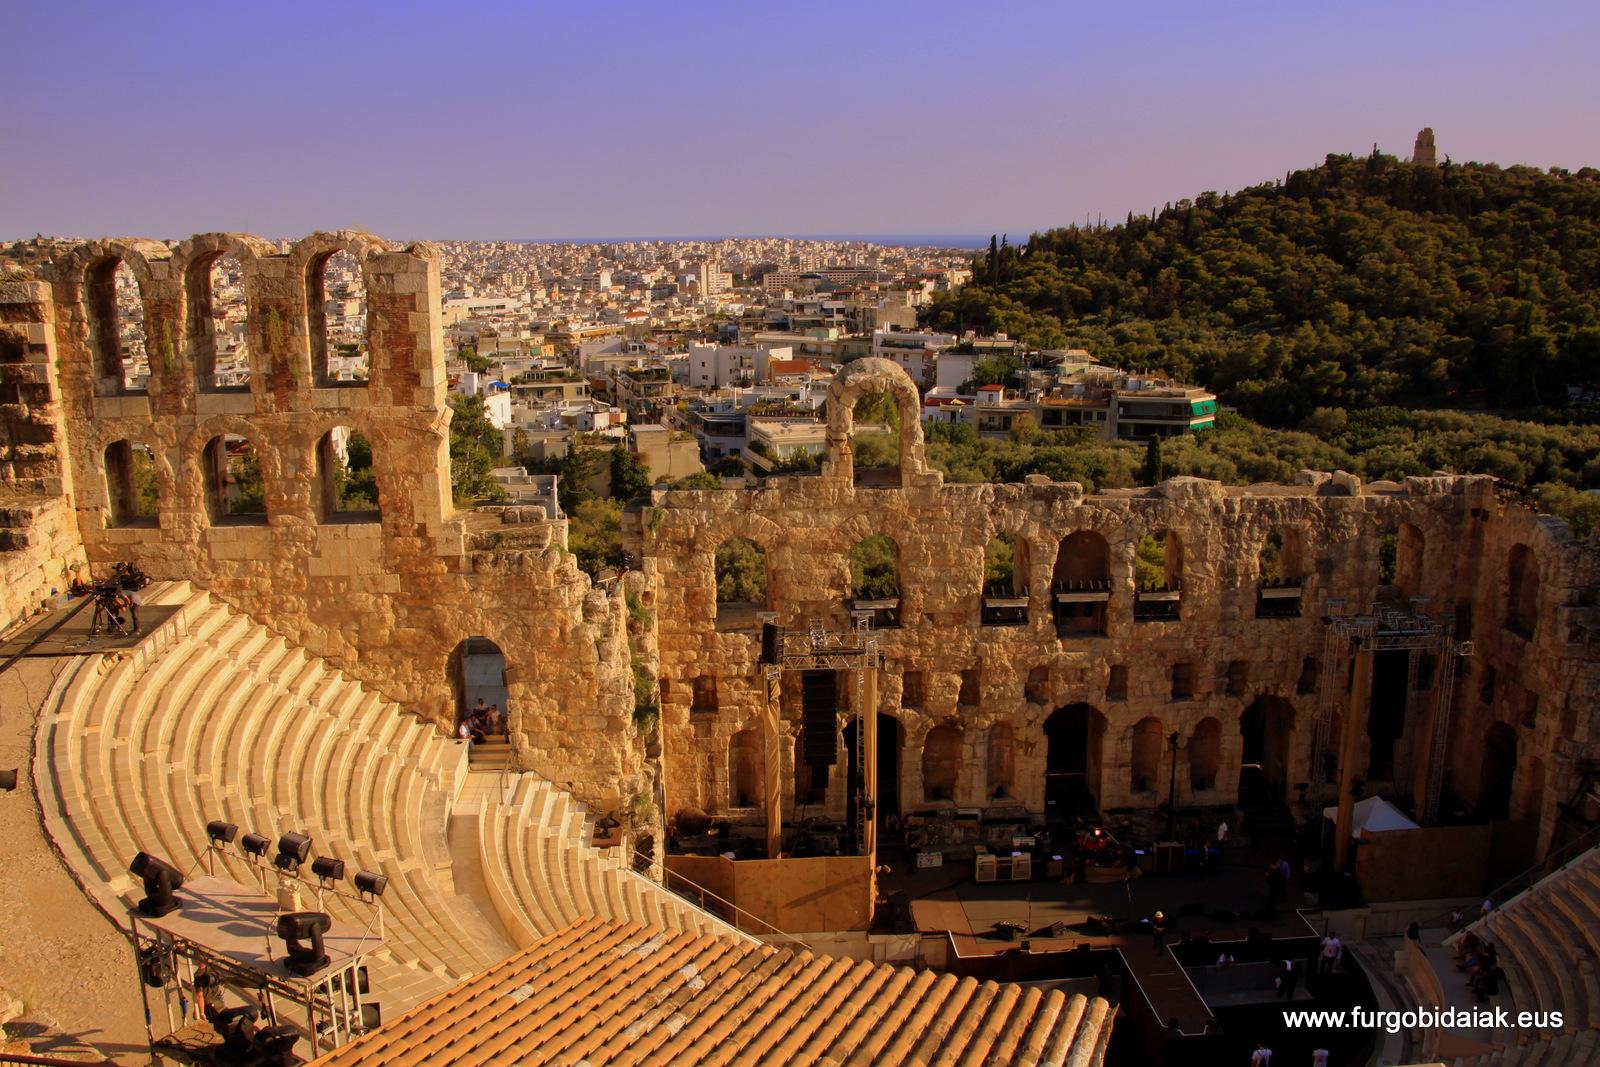 Teatro Herodes, Acrópolis, Atenas, Grecia